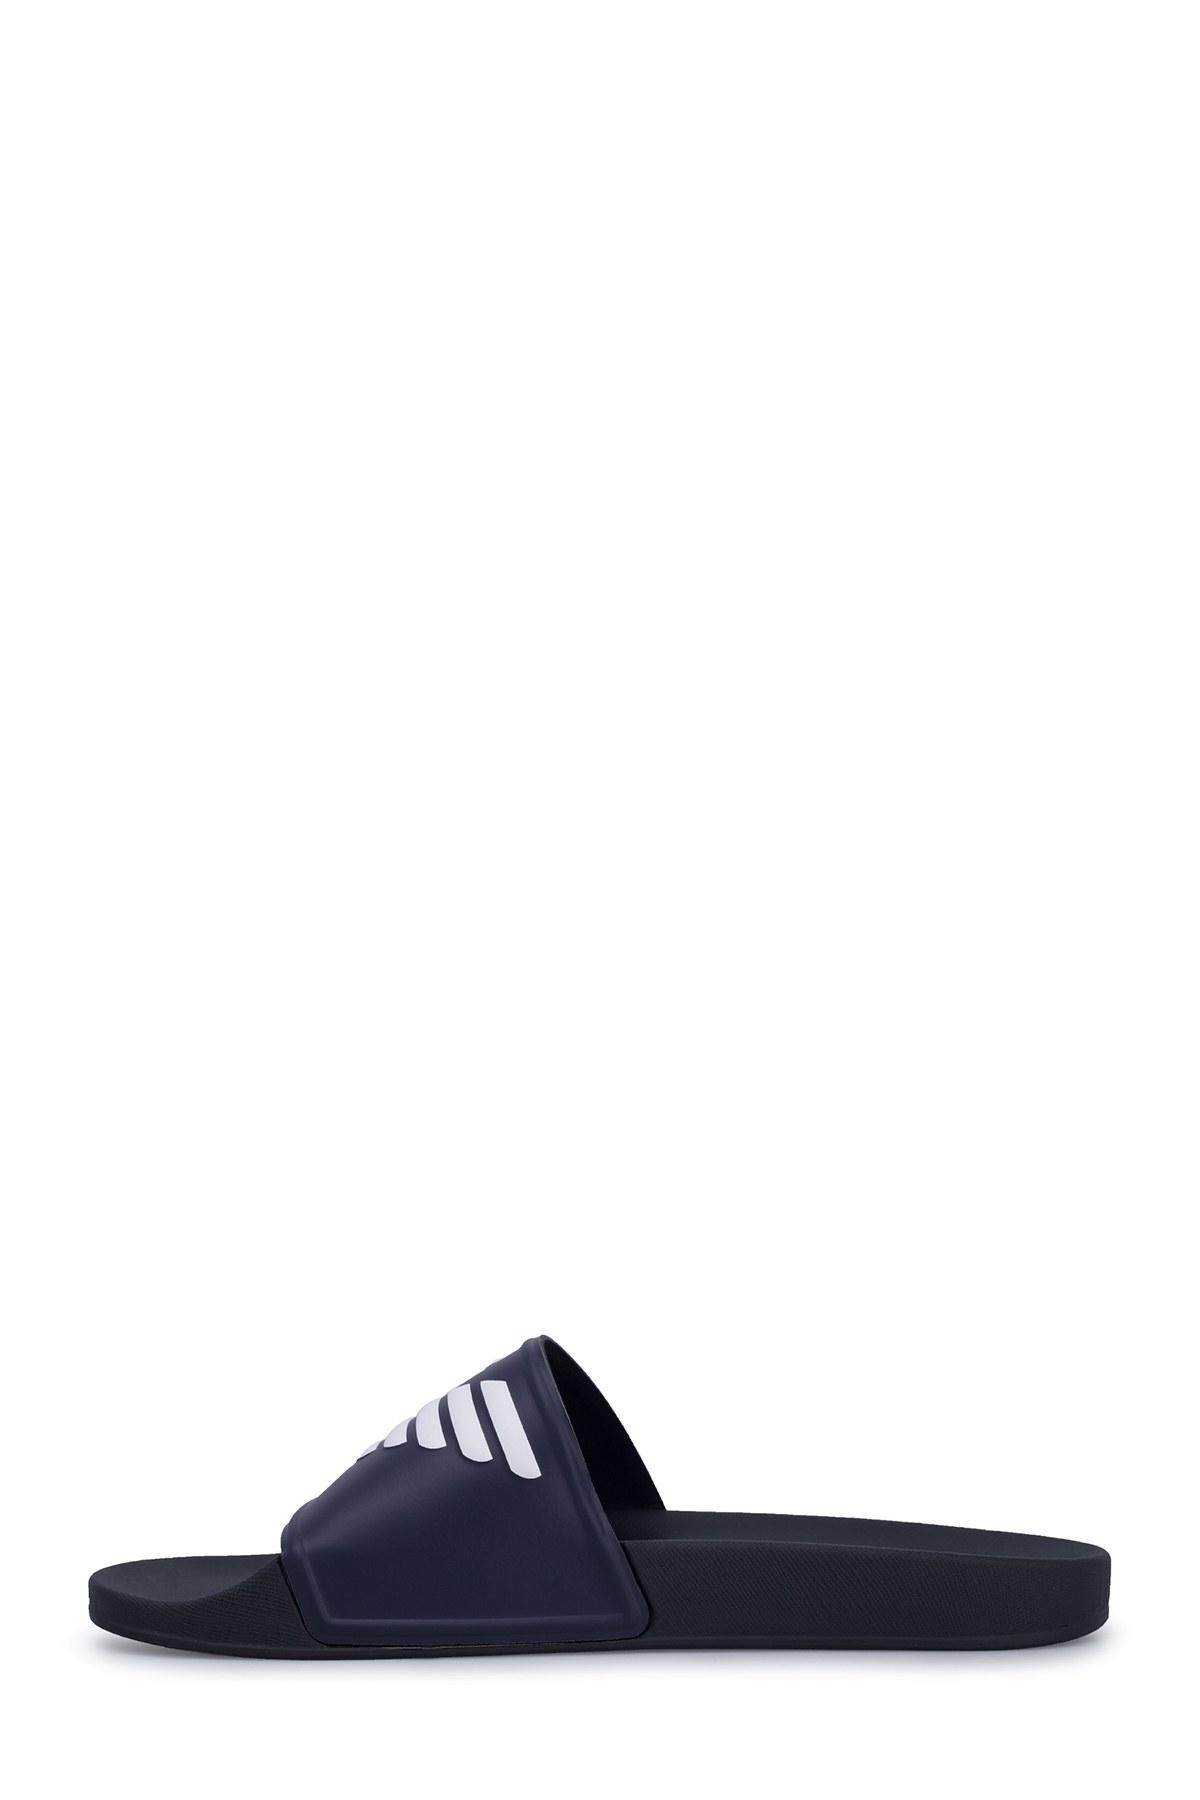 Emporio Armani Erkek Terlik X4PS01 XL828 D813 LACİVERT